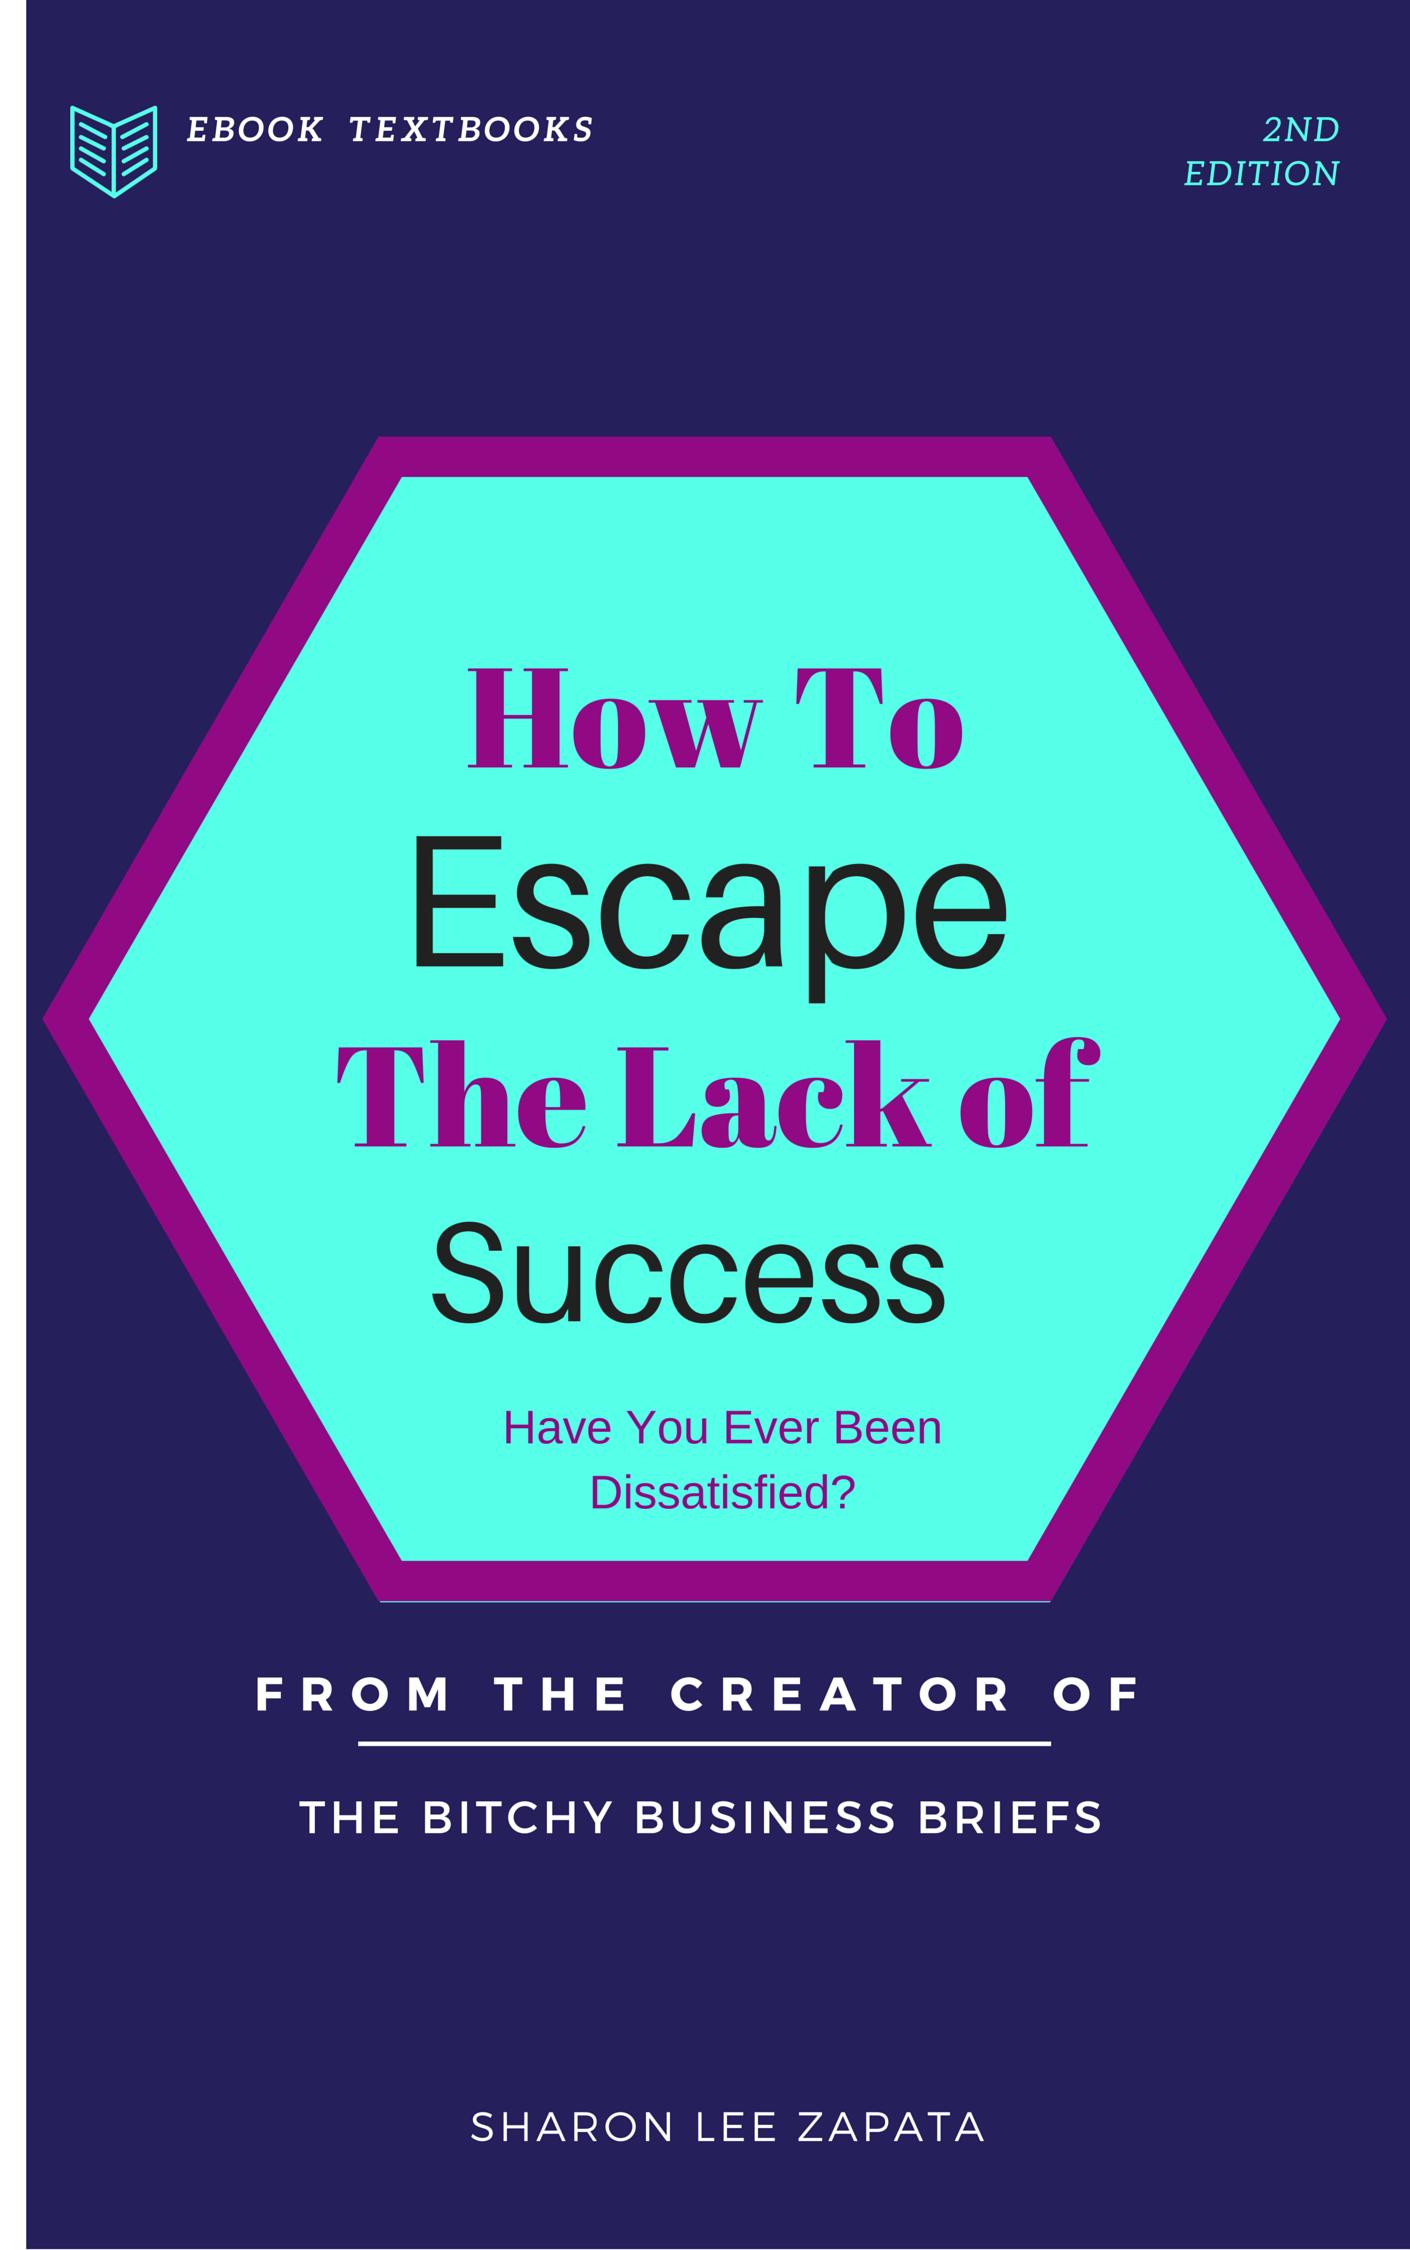 FREE e-Book How To Escape the Lack of Success